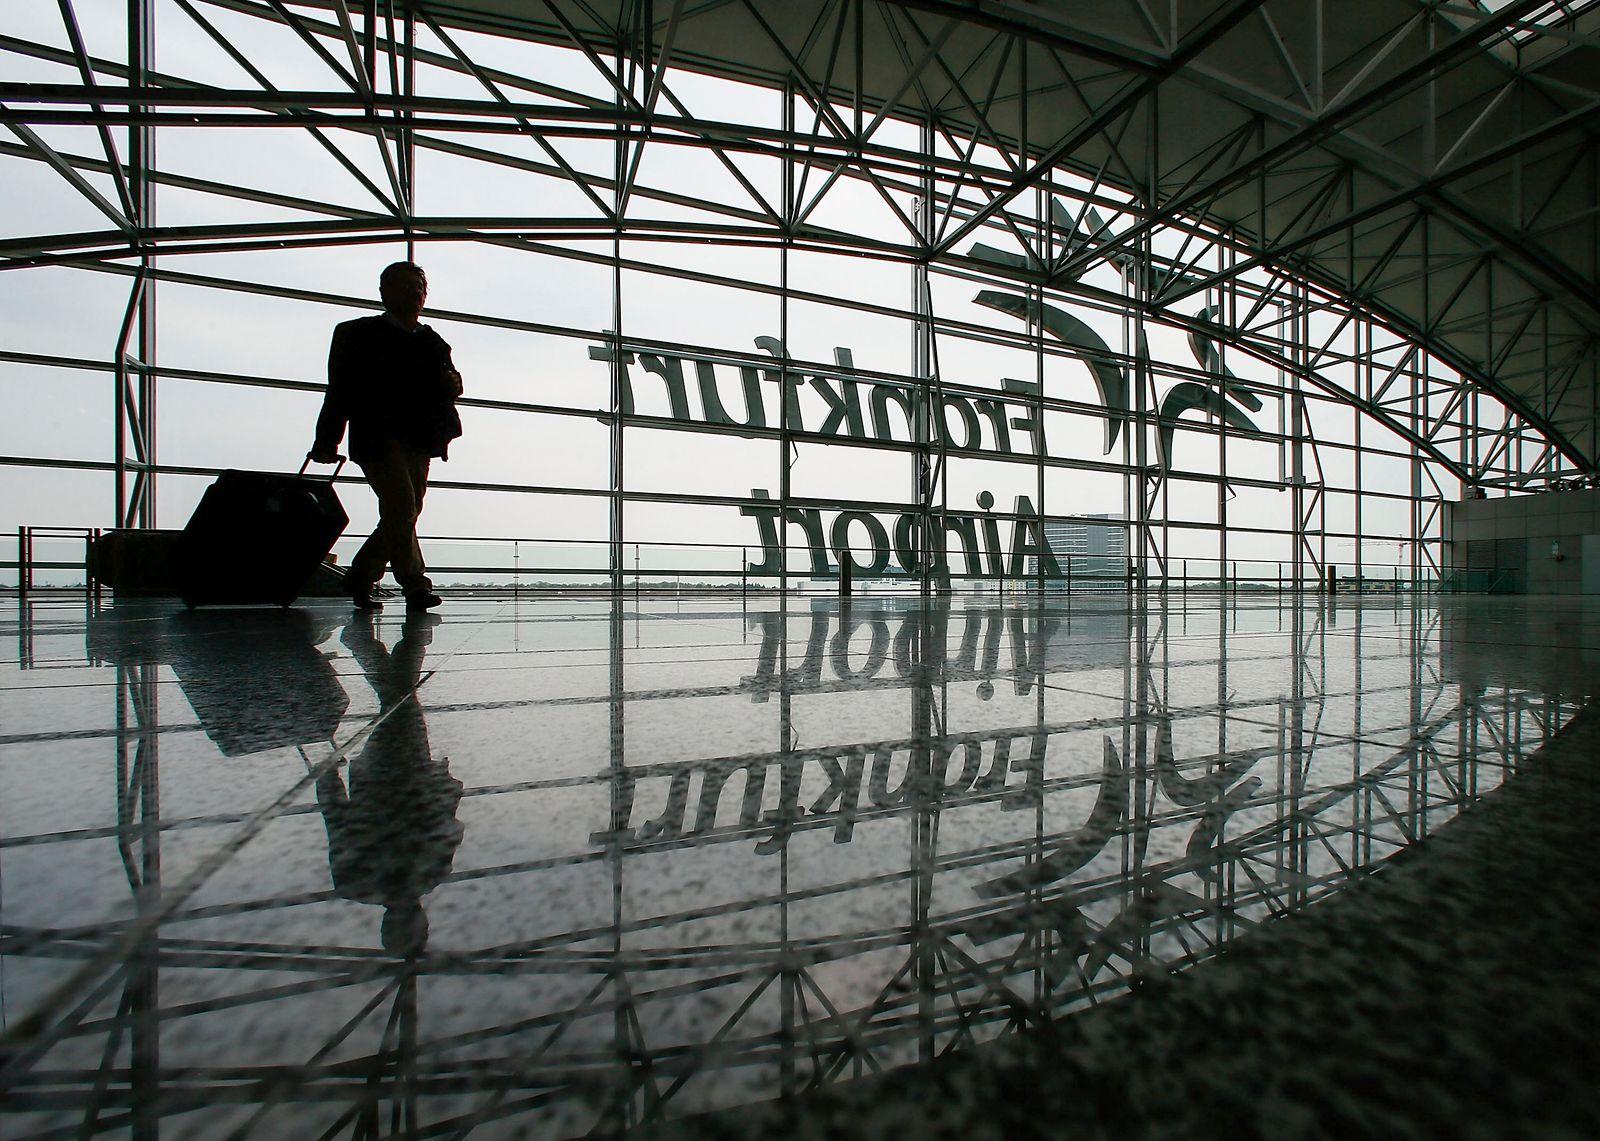 Lufthansa Strike Leads To Massive Flight Cancellations